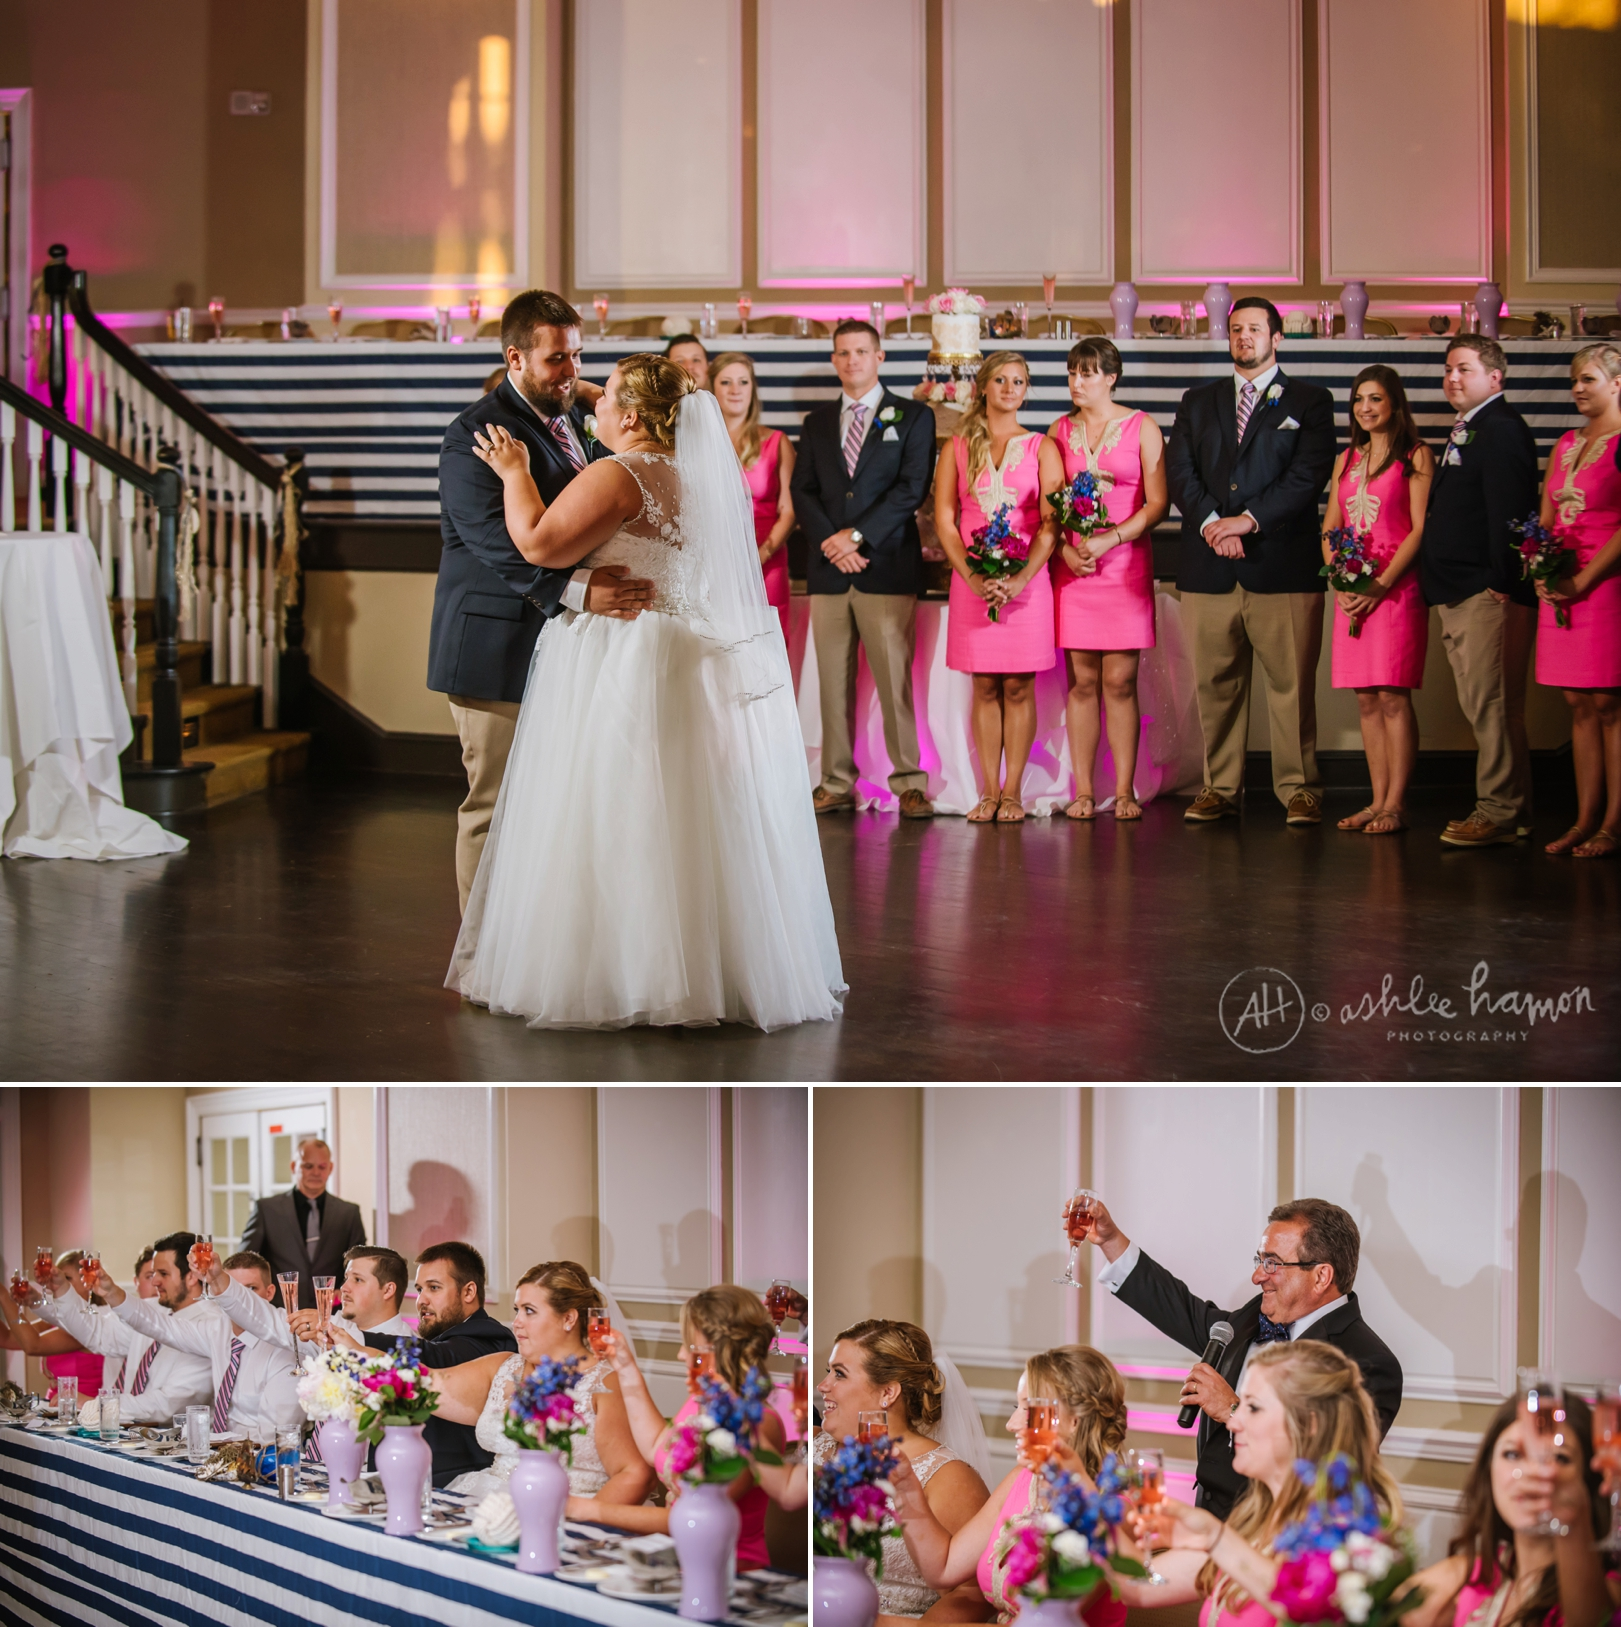 St-pete-wedding-photographer-don-caesar-ashlee-hamon_0030.jpg